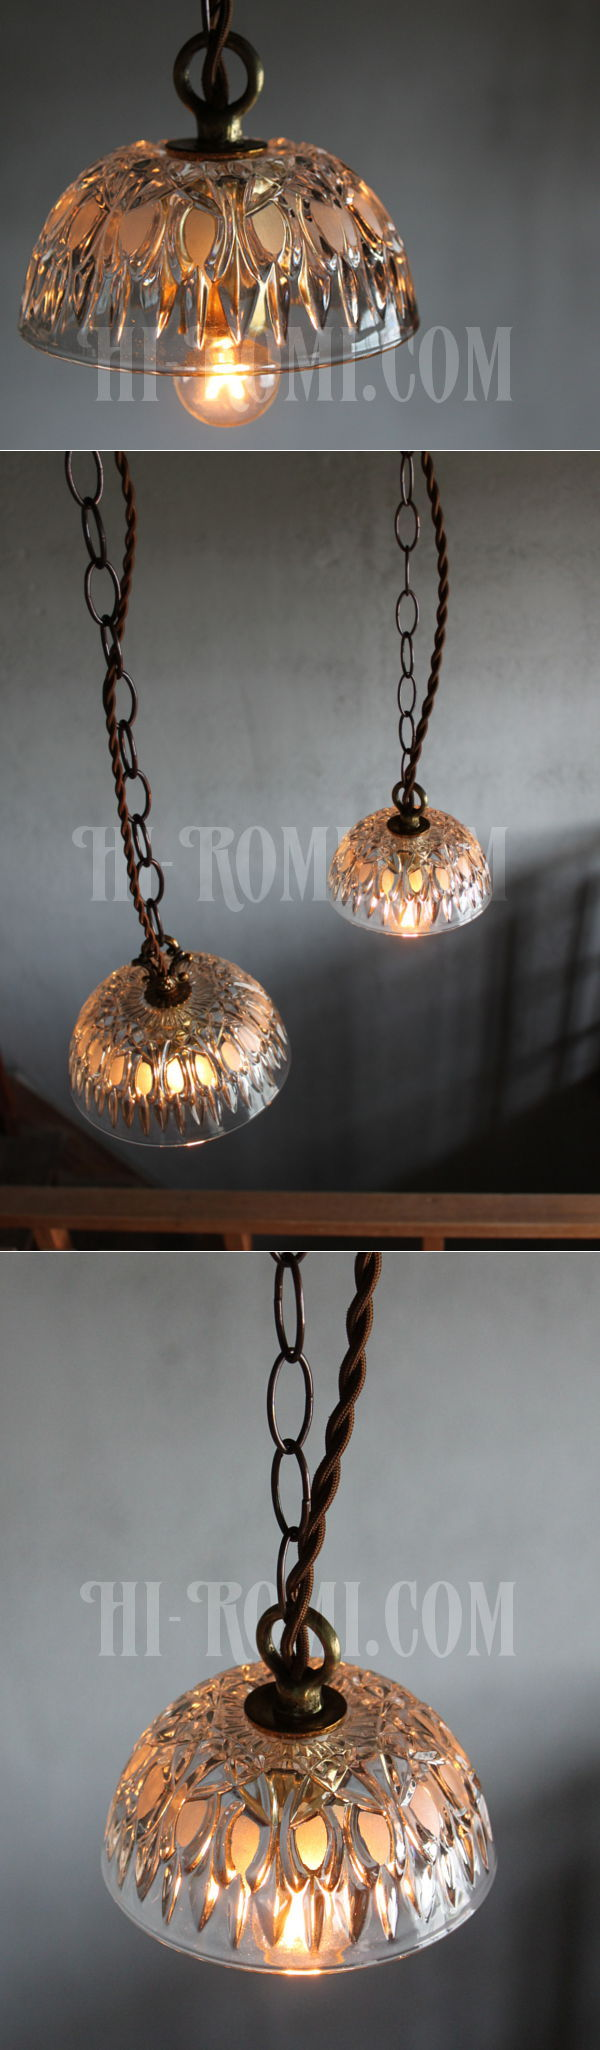 FRANCE製プレスガラスシェード1灯ミニペンダントランプ小/アンティーク吊下照明